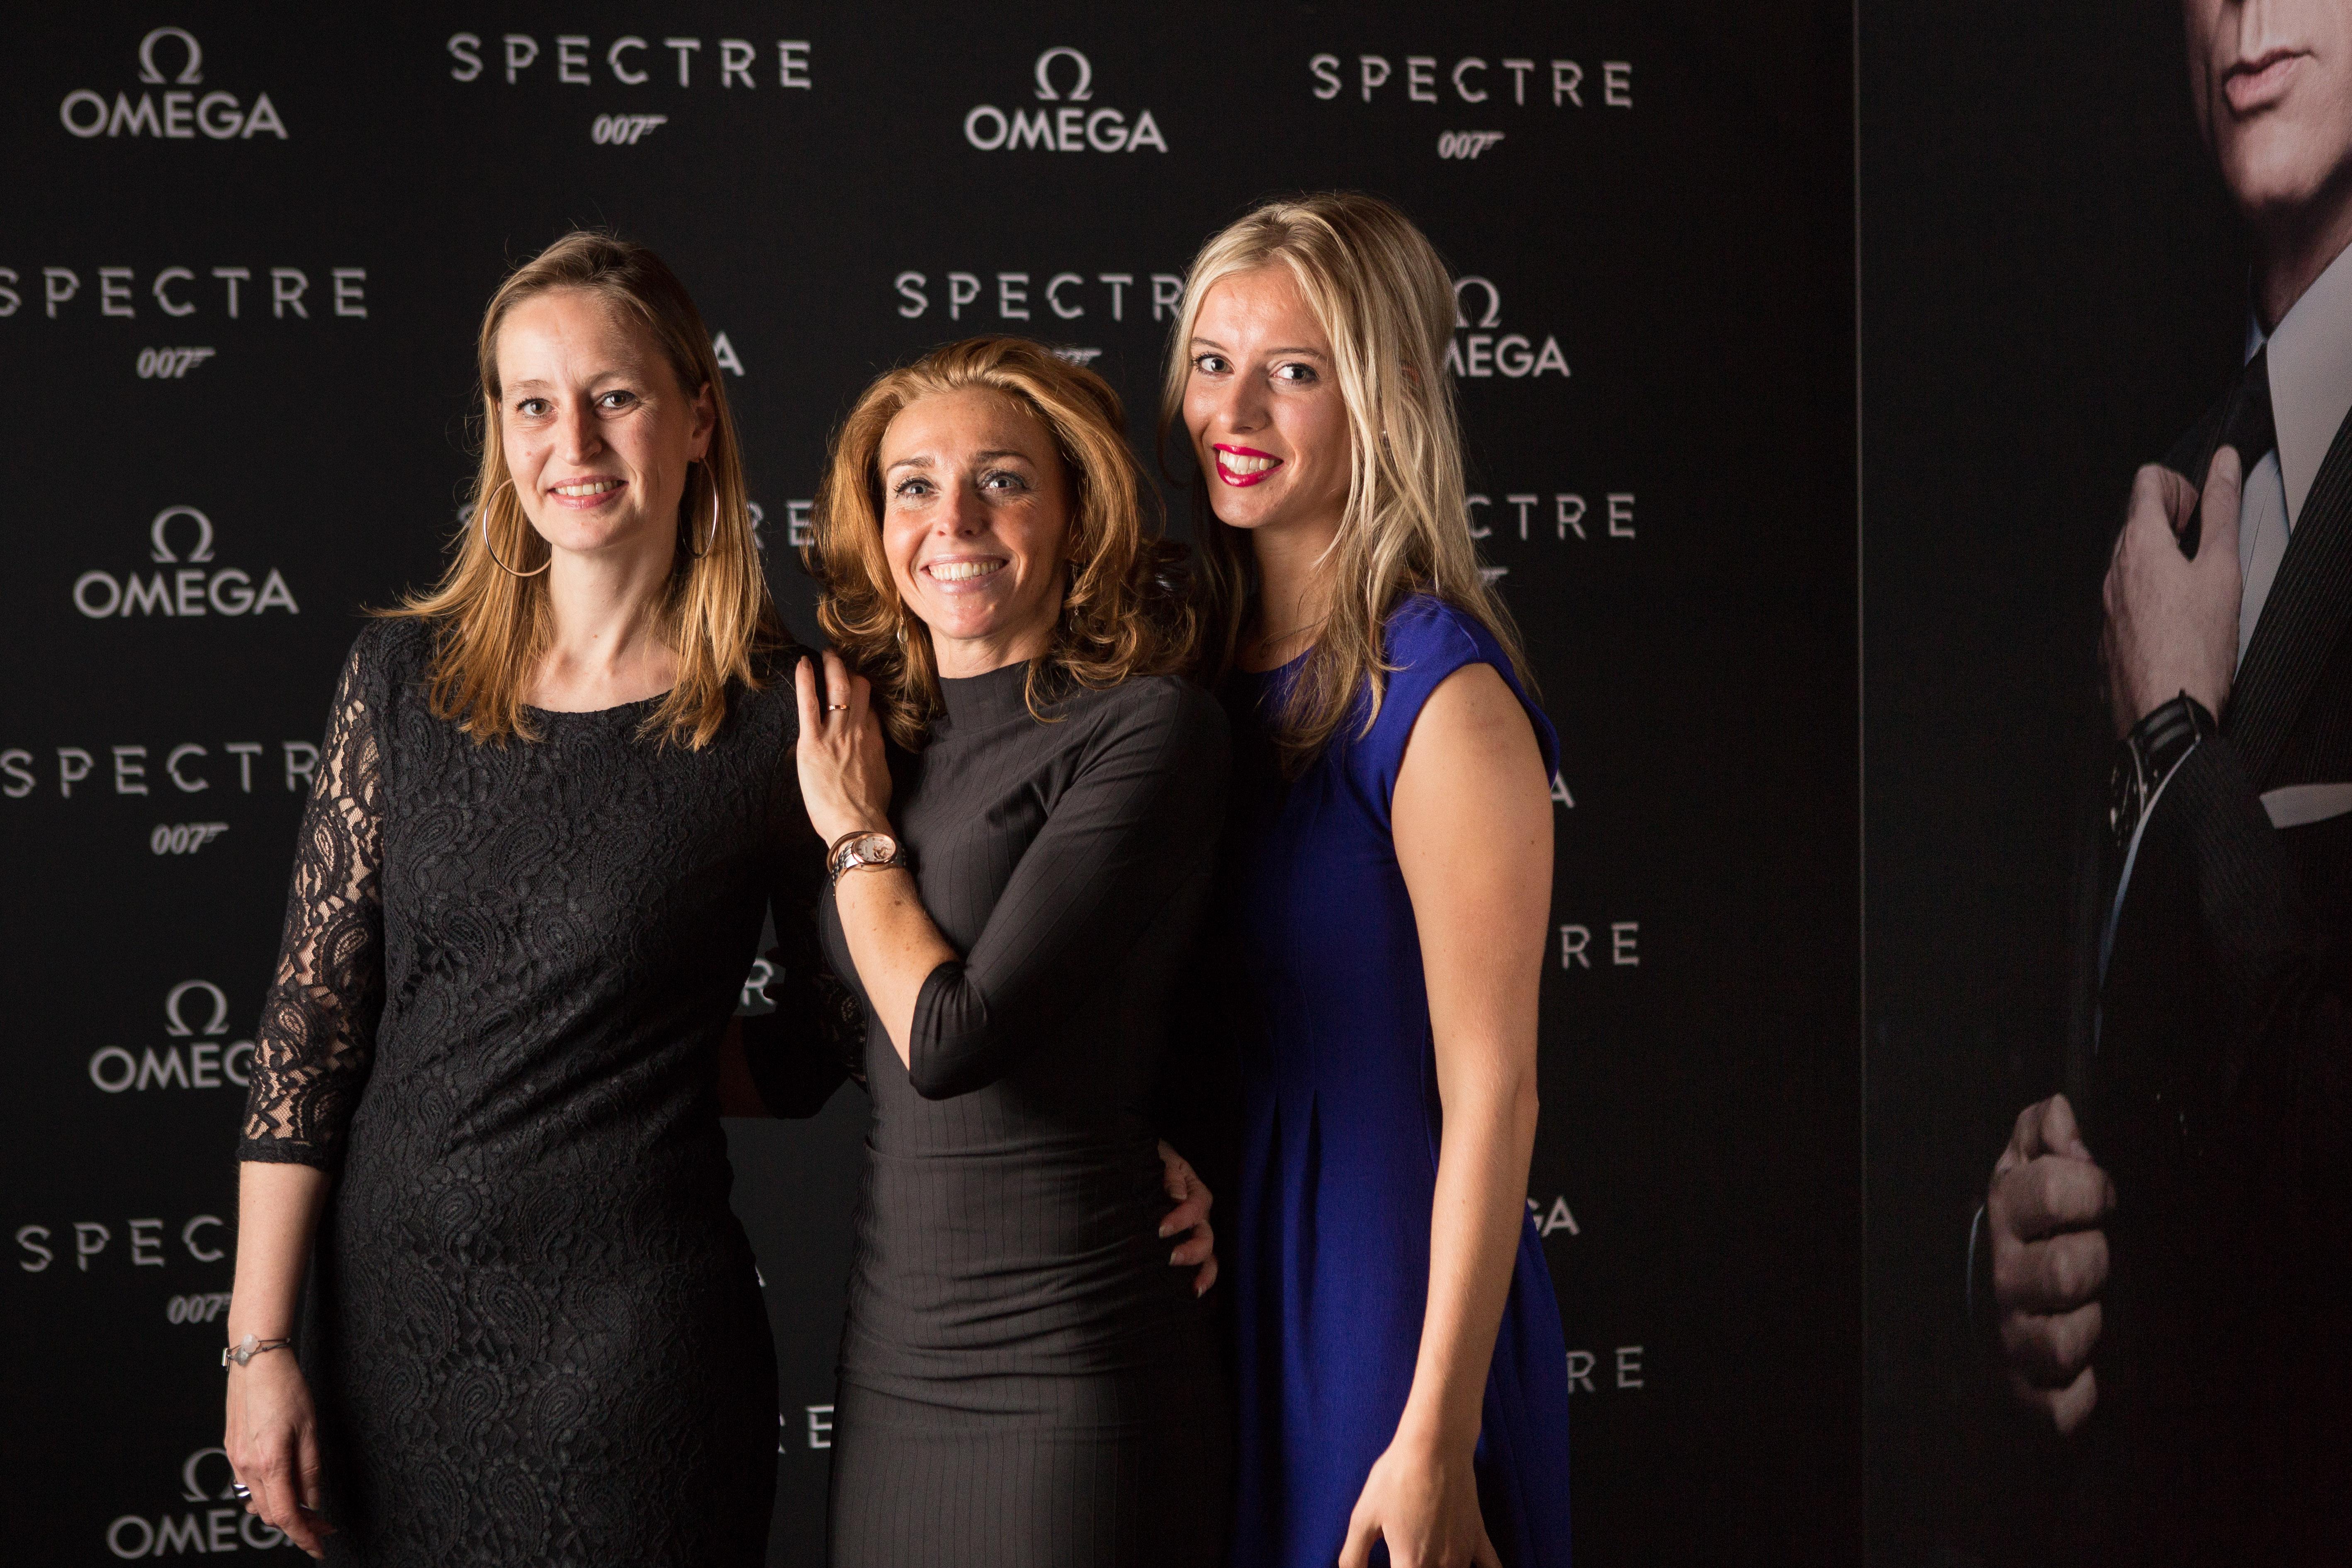 spectre-omega wall-46